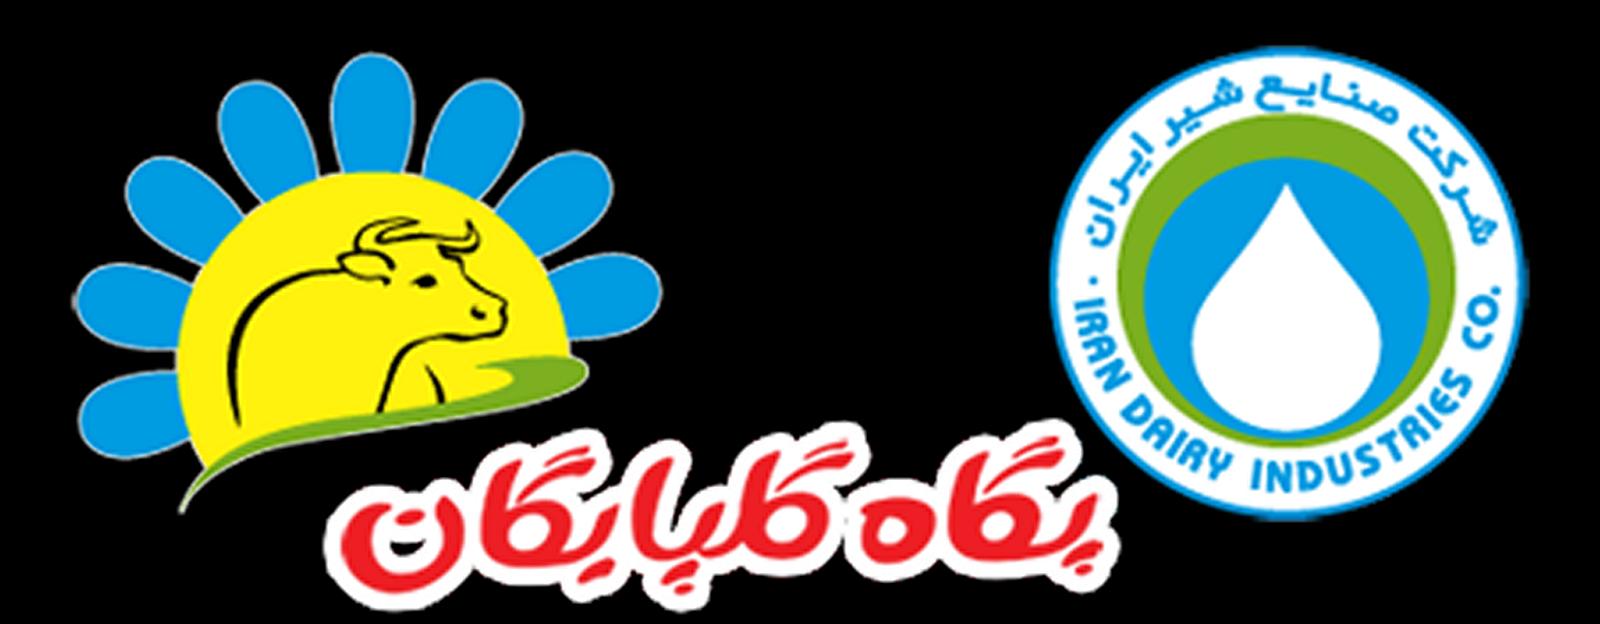 logo6-1 [1600x1200]